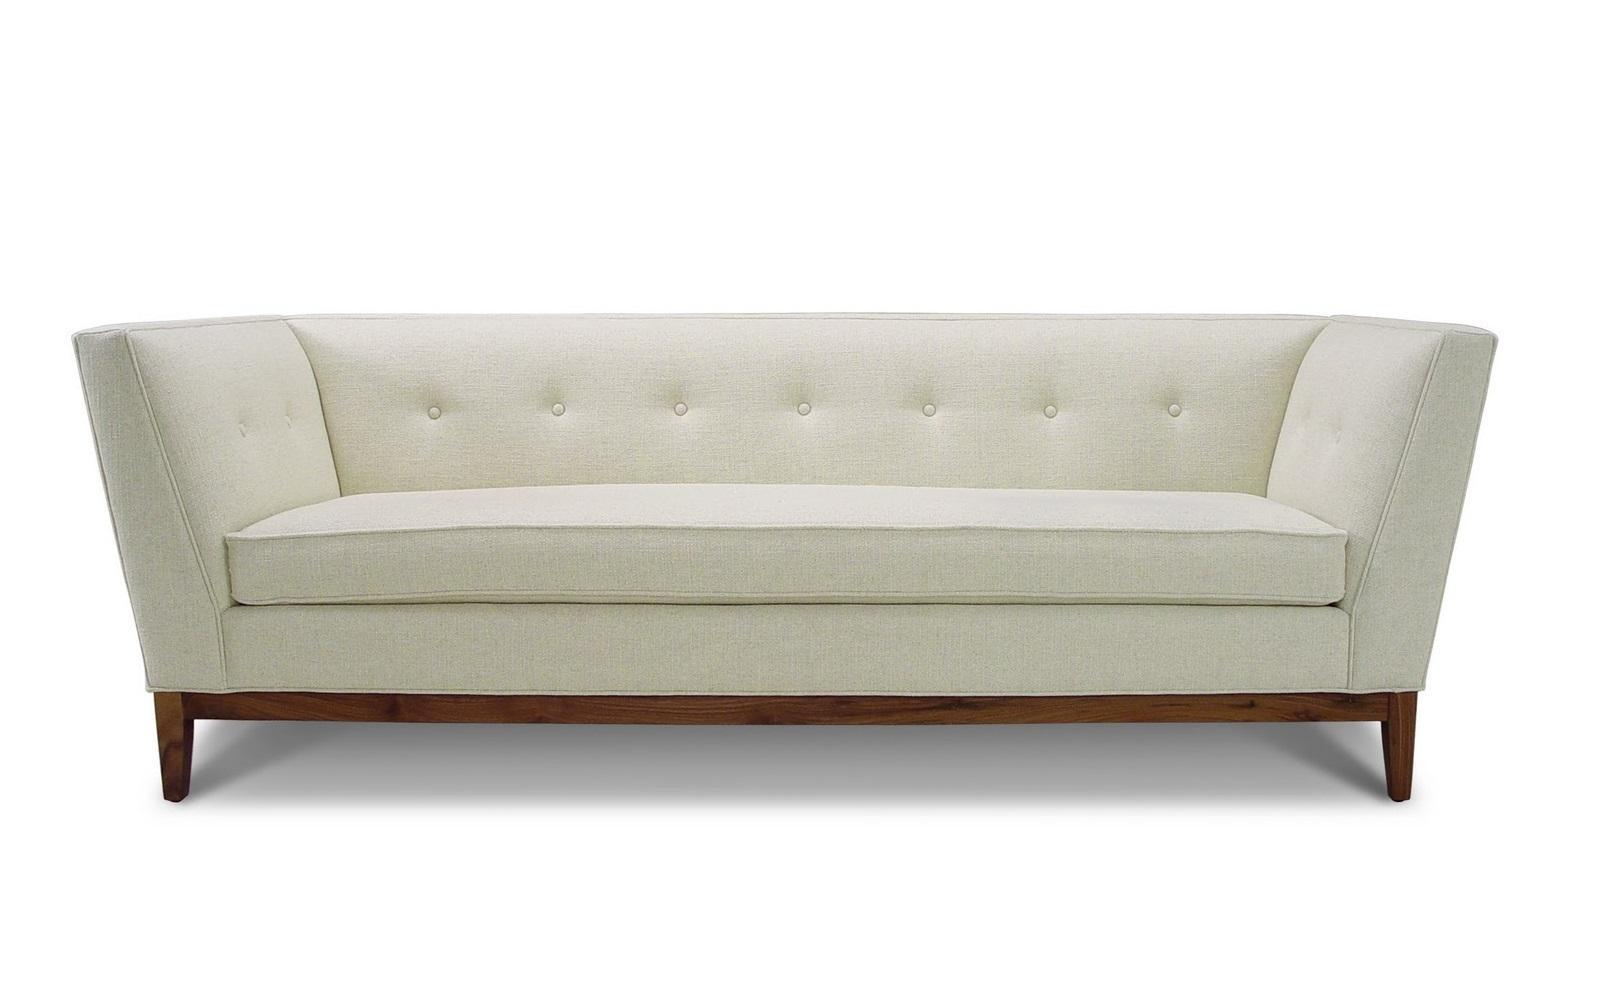 Sofas – Rebelle Home | Furniture Store Medford Oregon Inside Jonathan Sofa (Image 18 of 20)